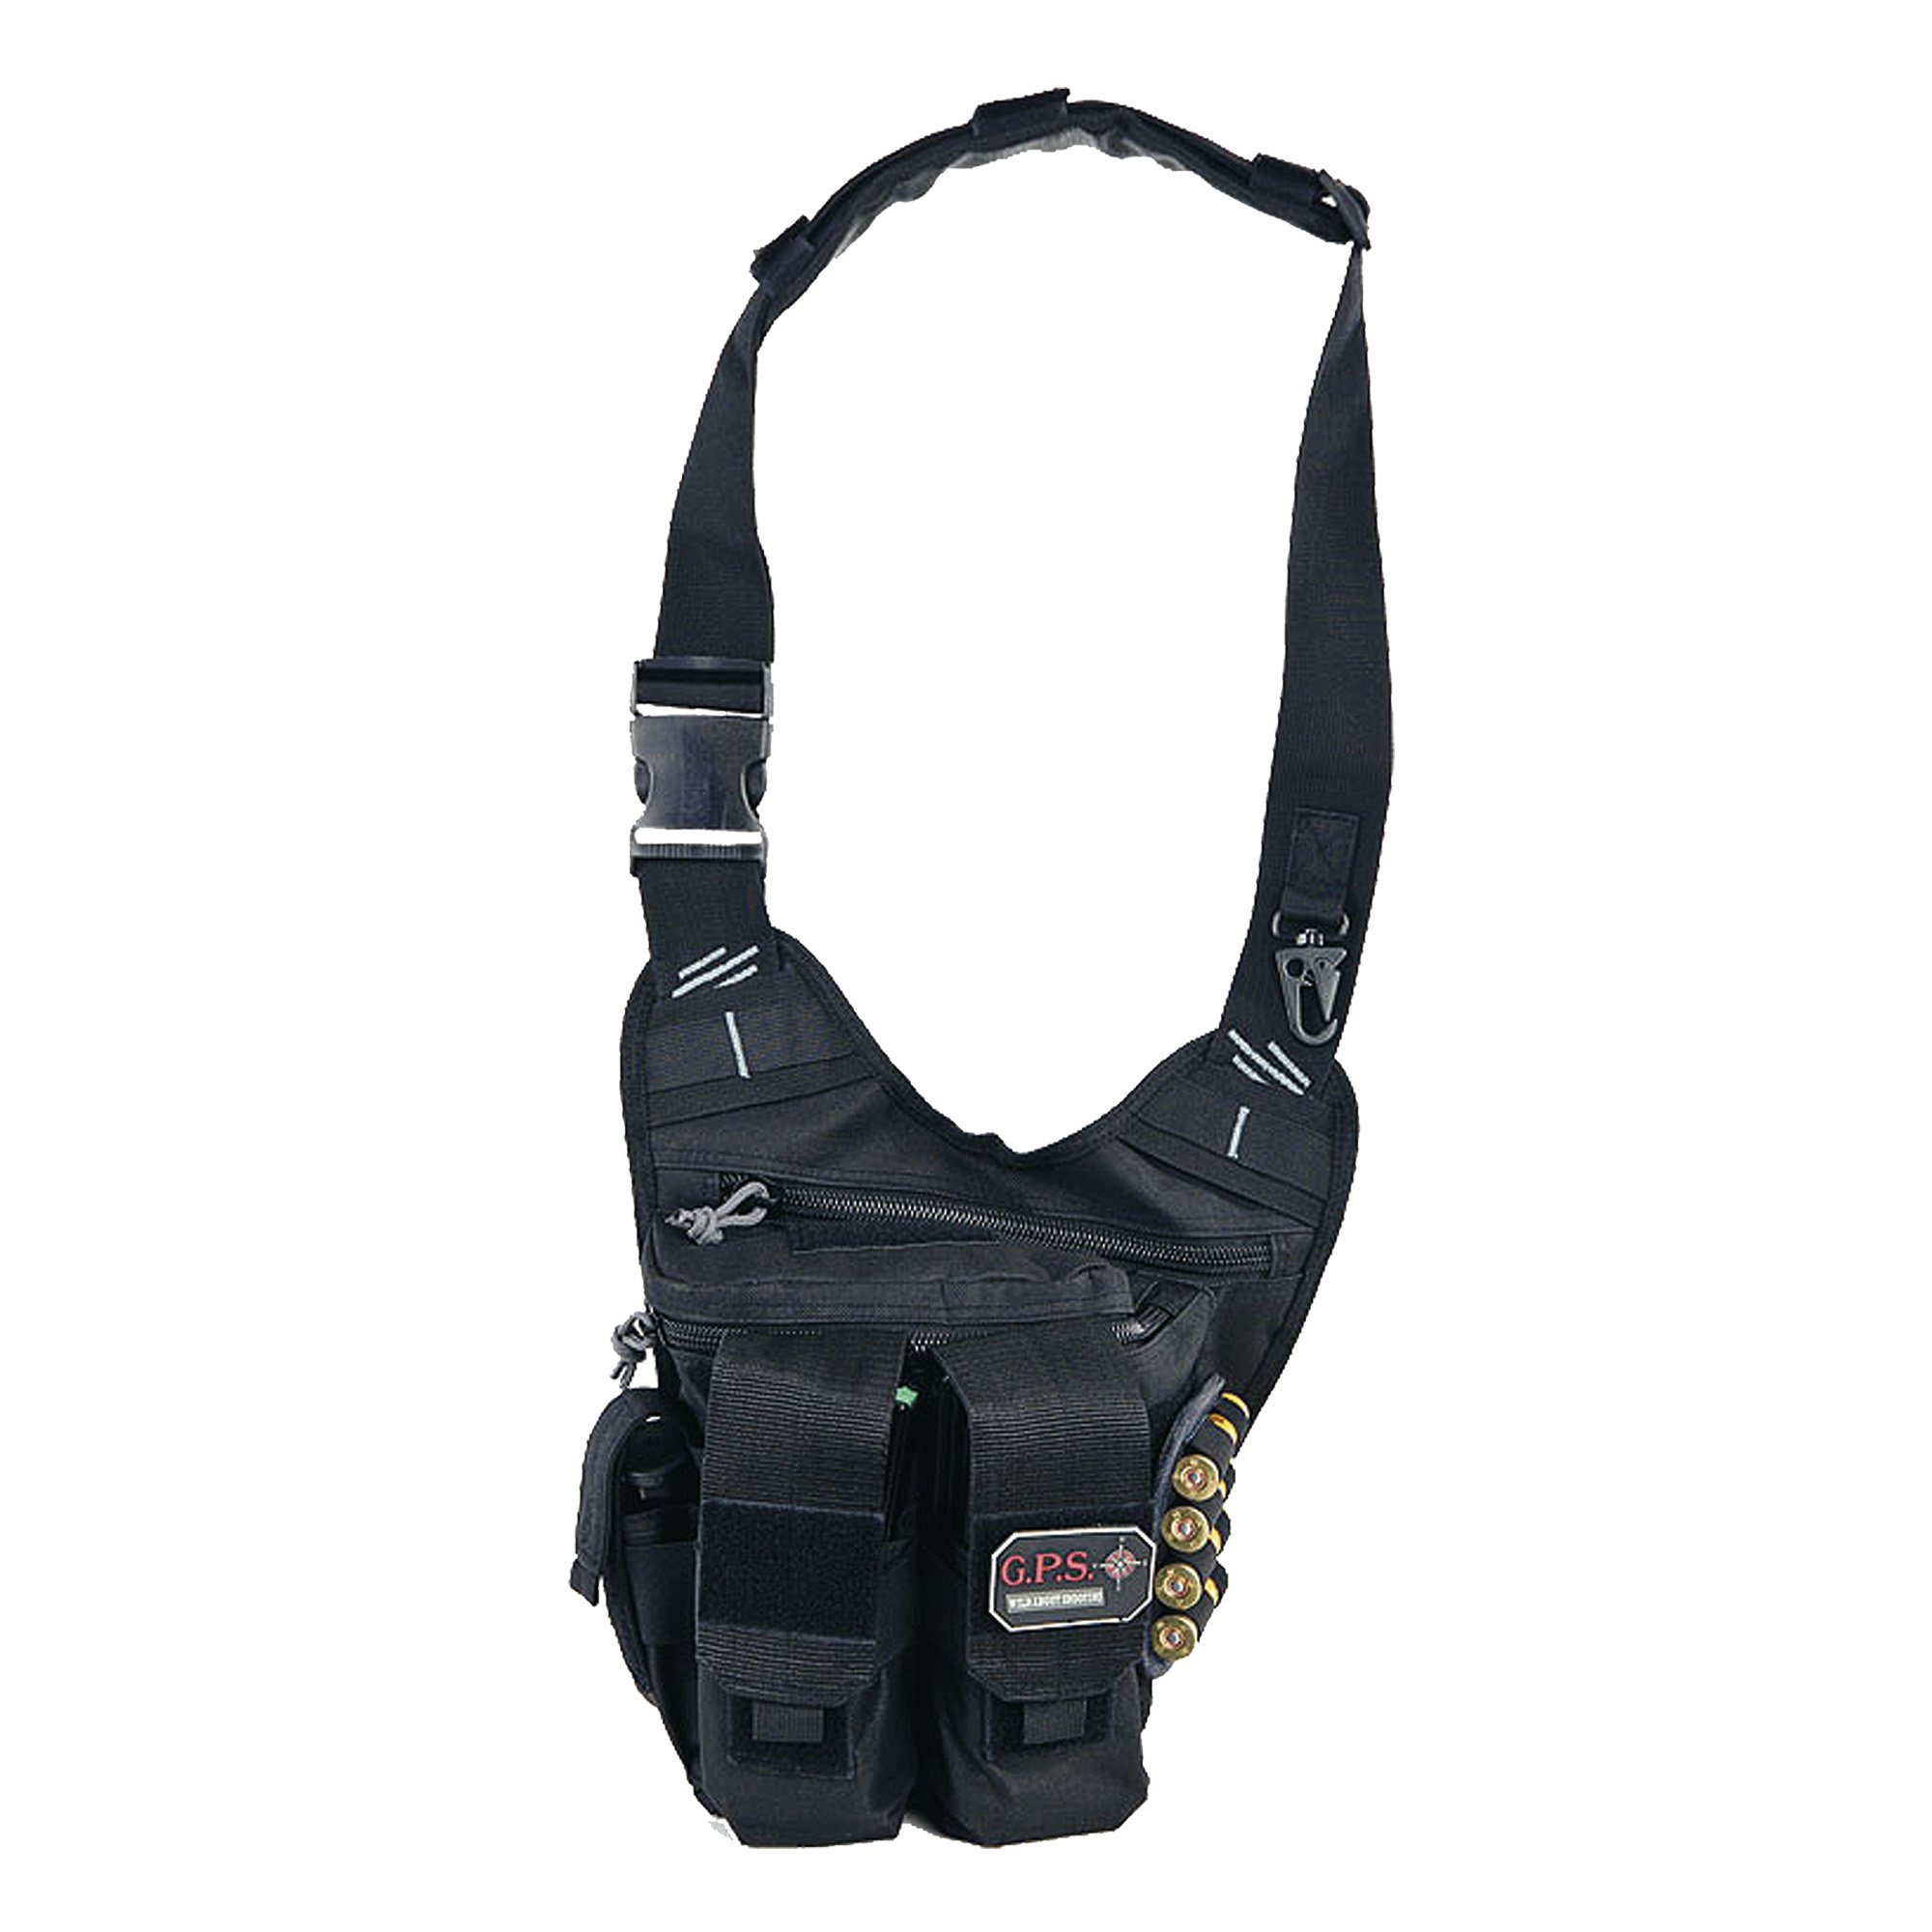 G-Outdoors, Inc. Soft Rapid Deployment Shoulder Bag, Medium by G5 Outdoors (Image #1)